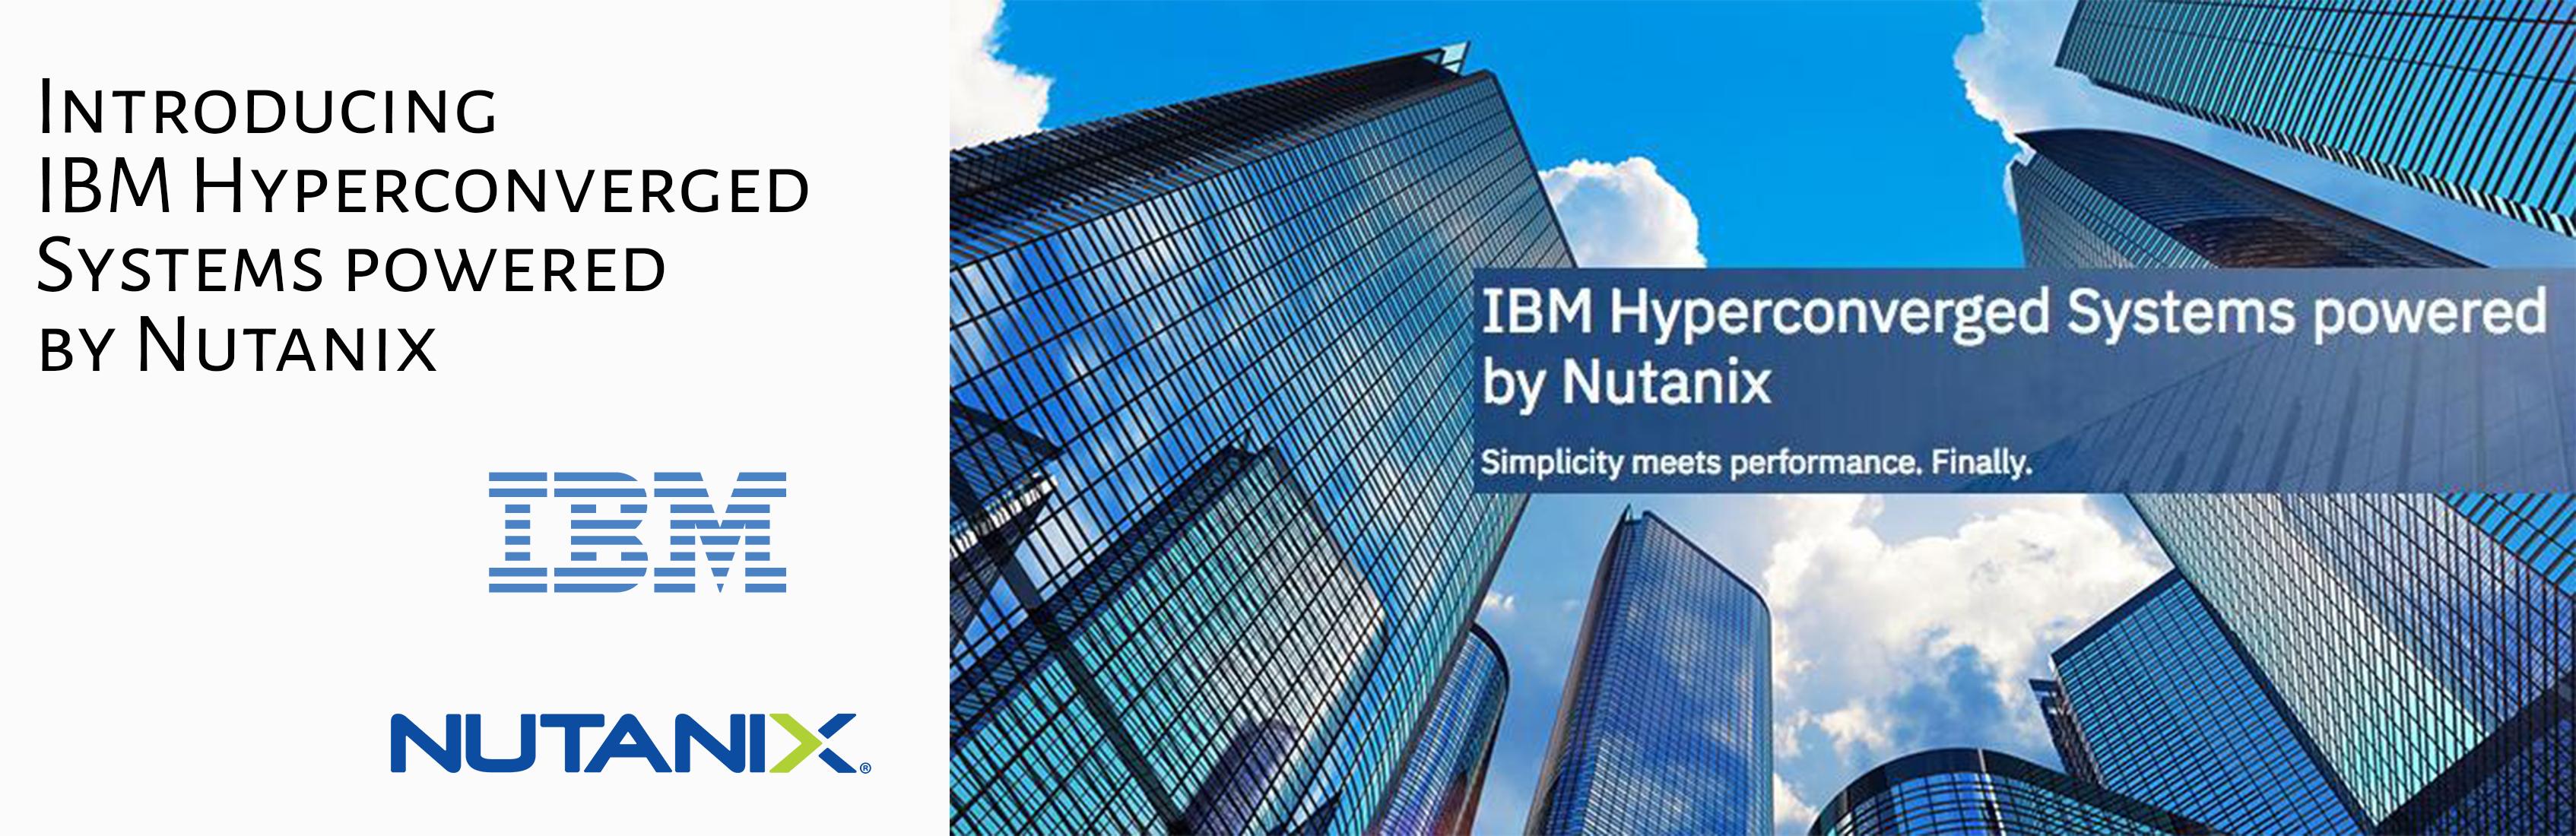 IBM Nutanix Hyperconverged